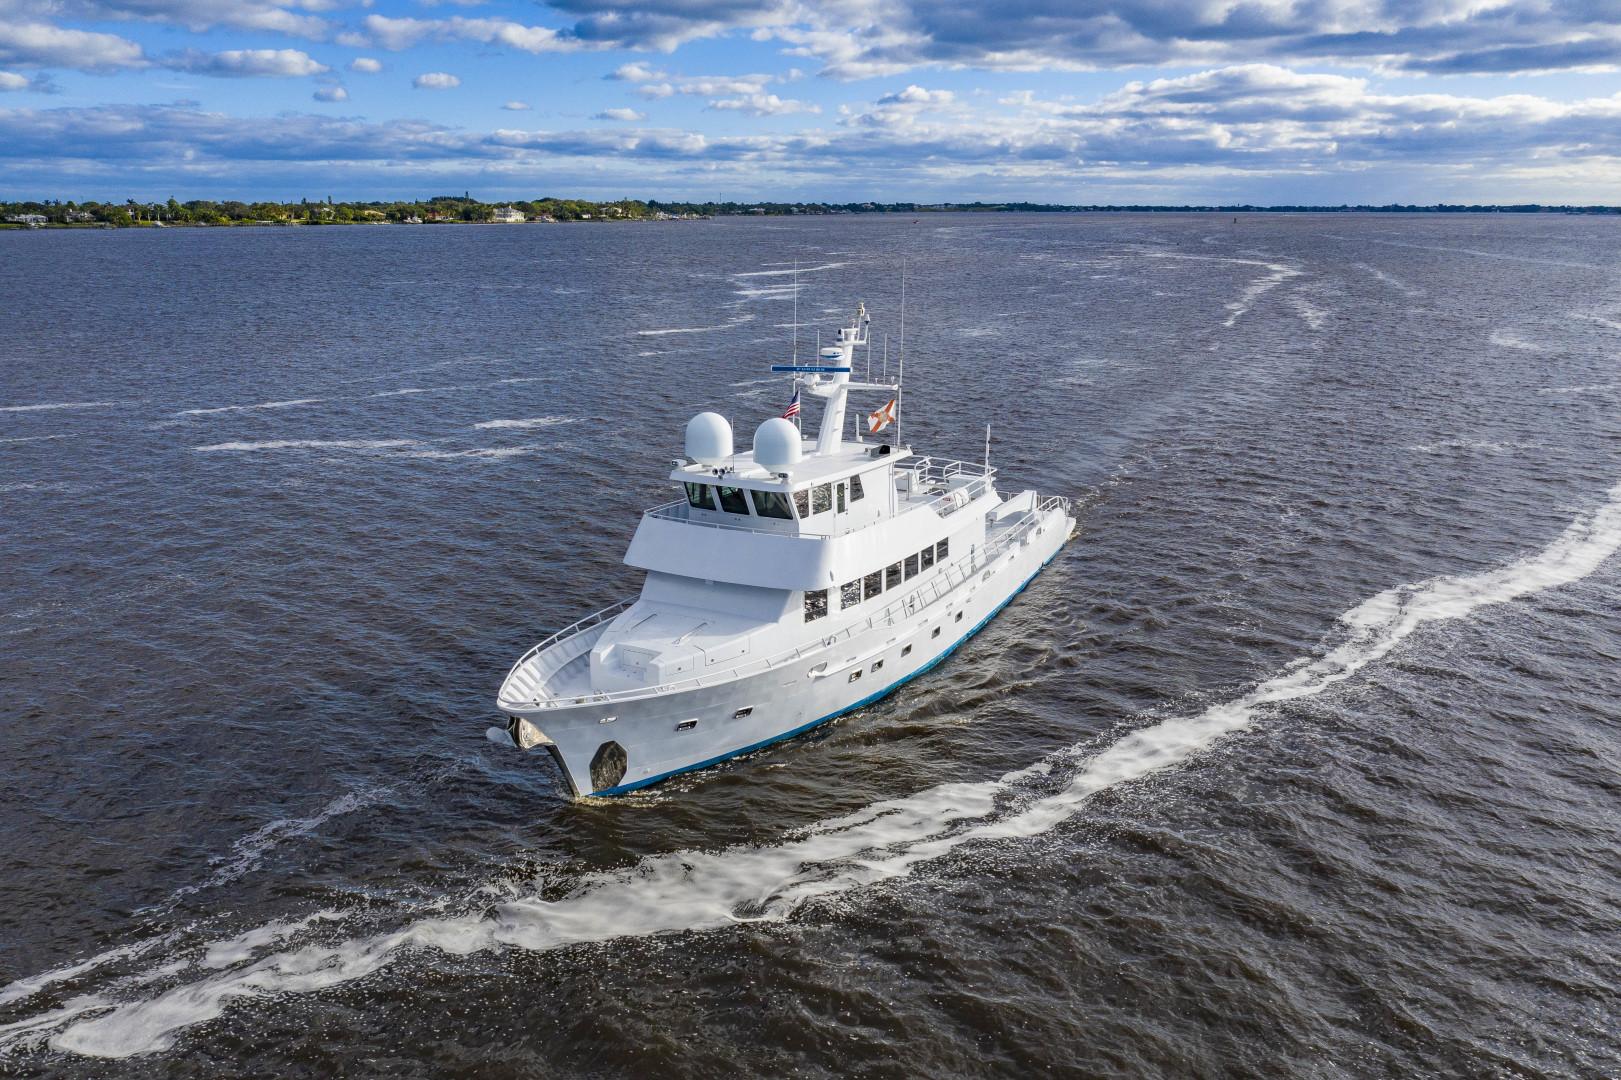 GlassTech-Expedition Yacht 2018-Reset Stuart-Florida-United States-Profile-1568525 | Thumbnail